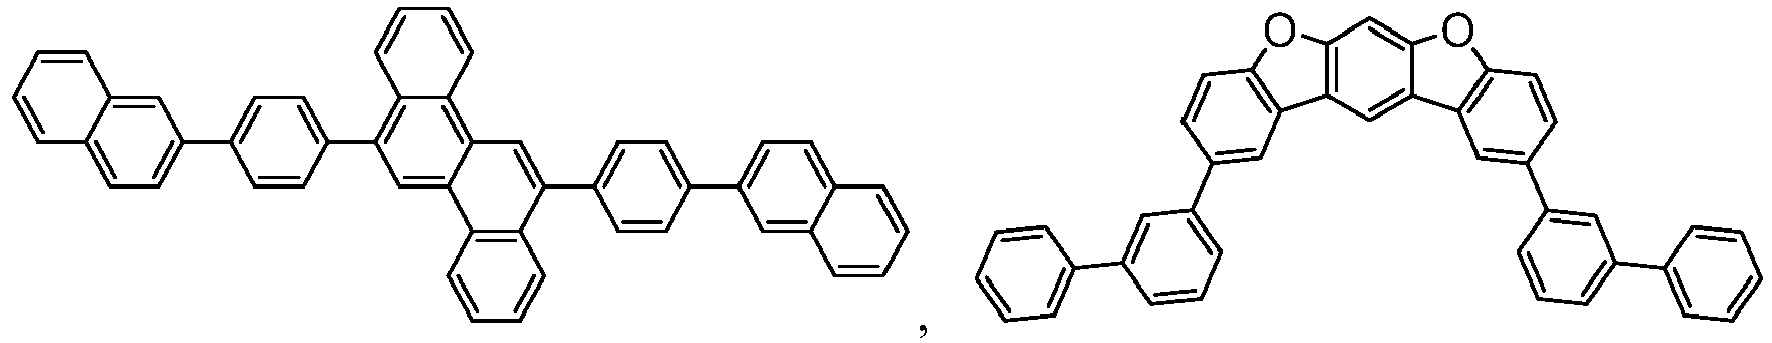 Figure imgb0907